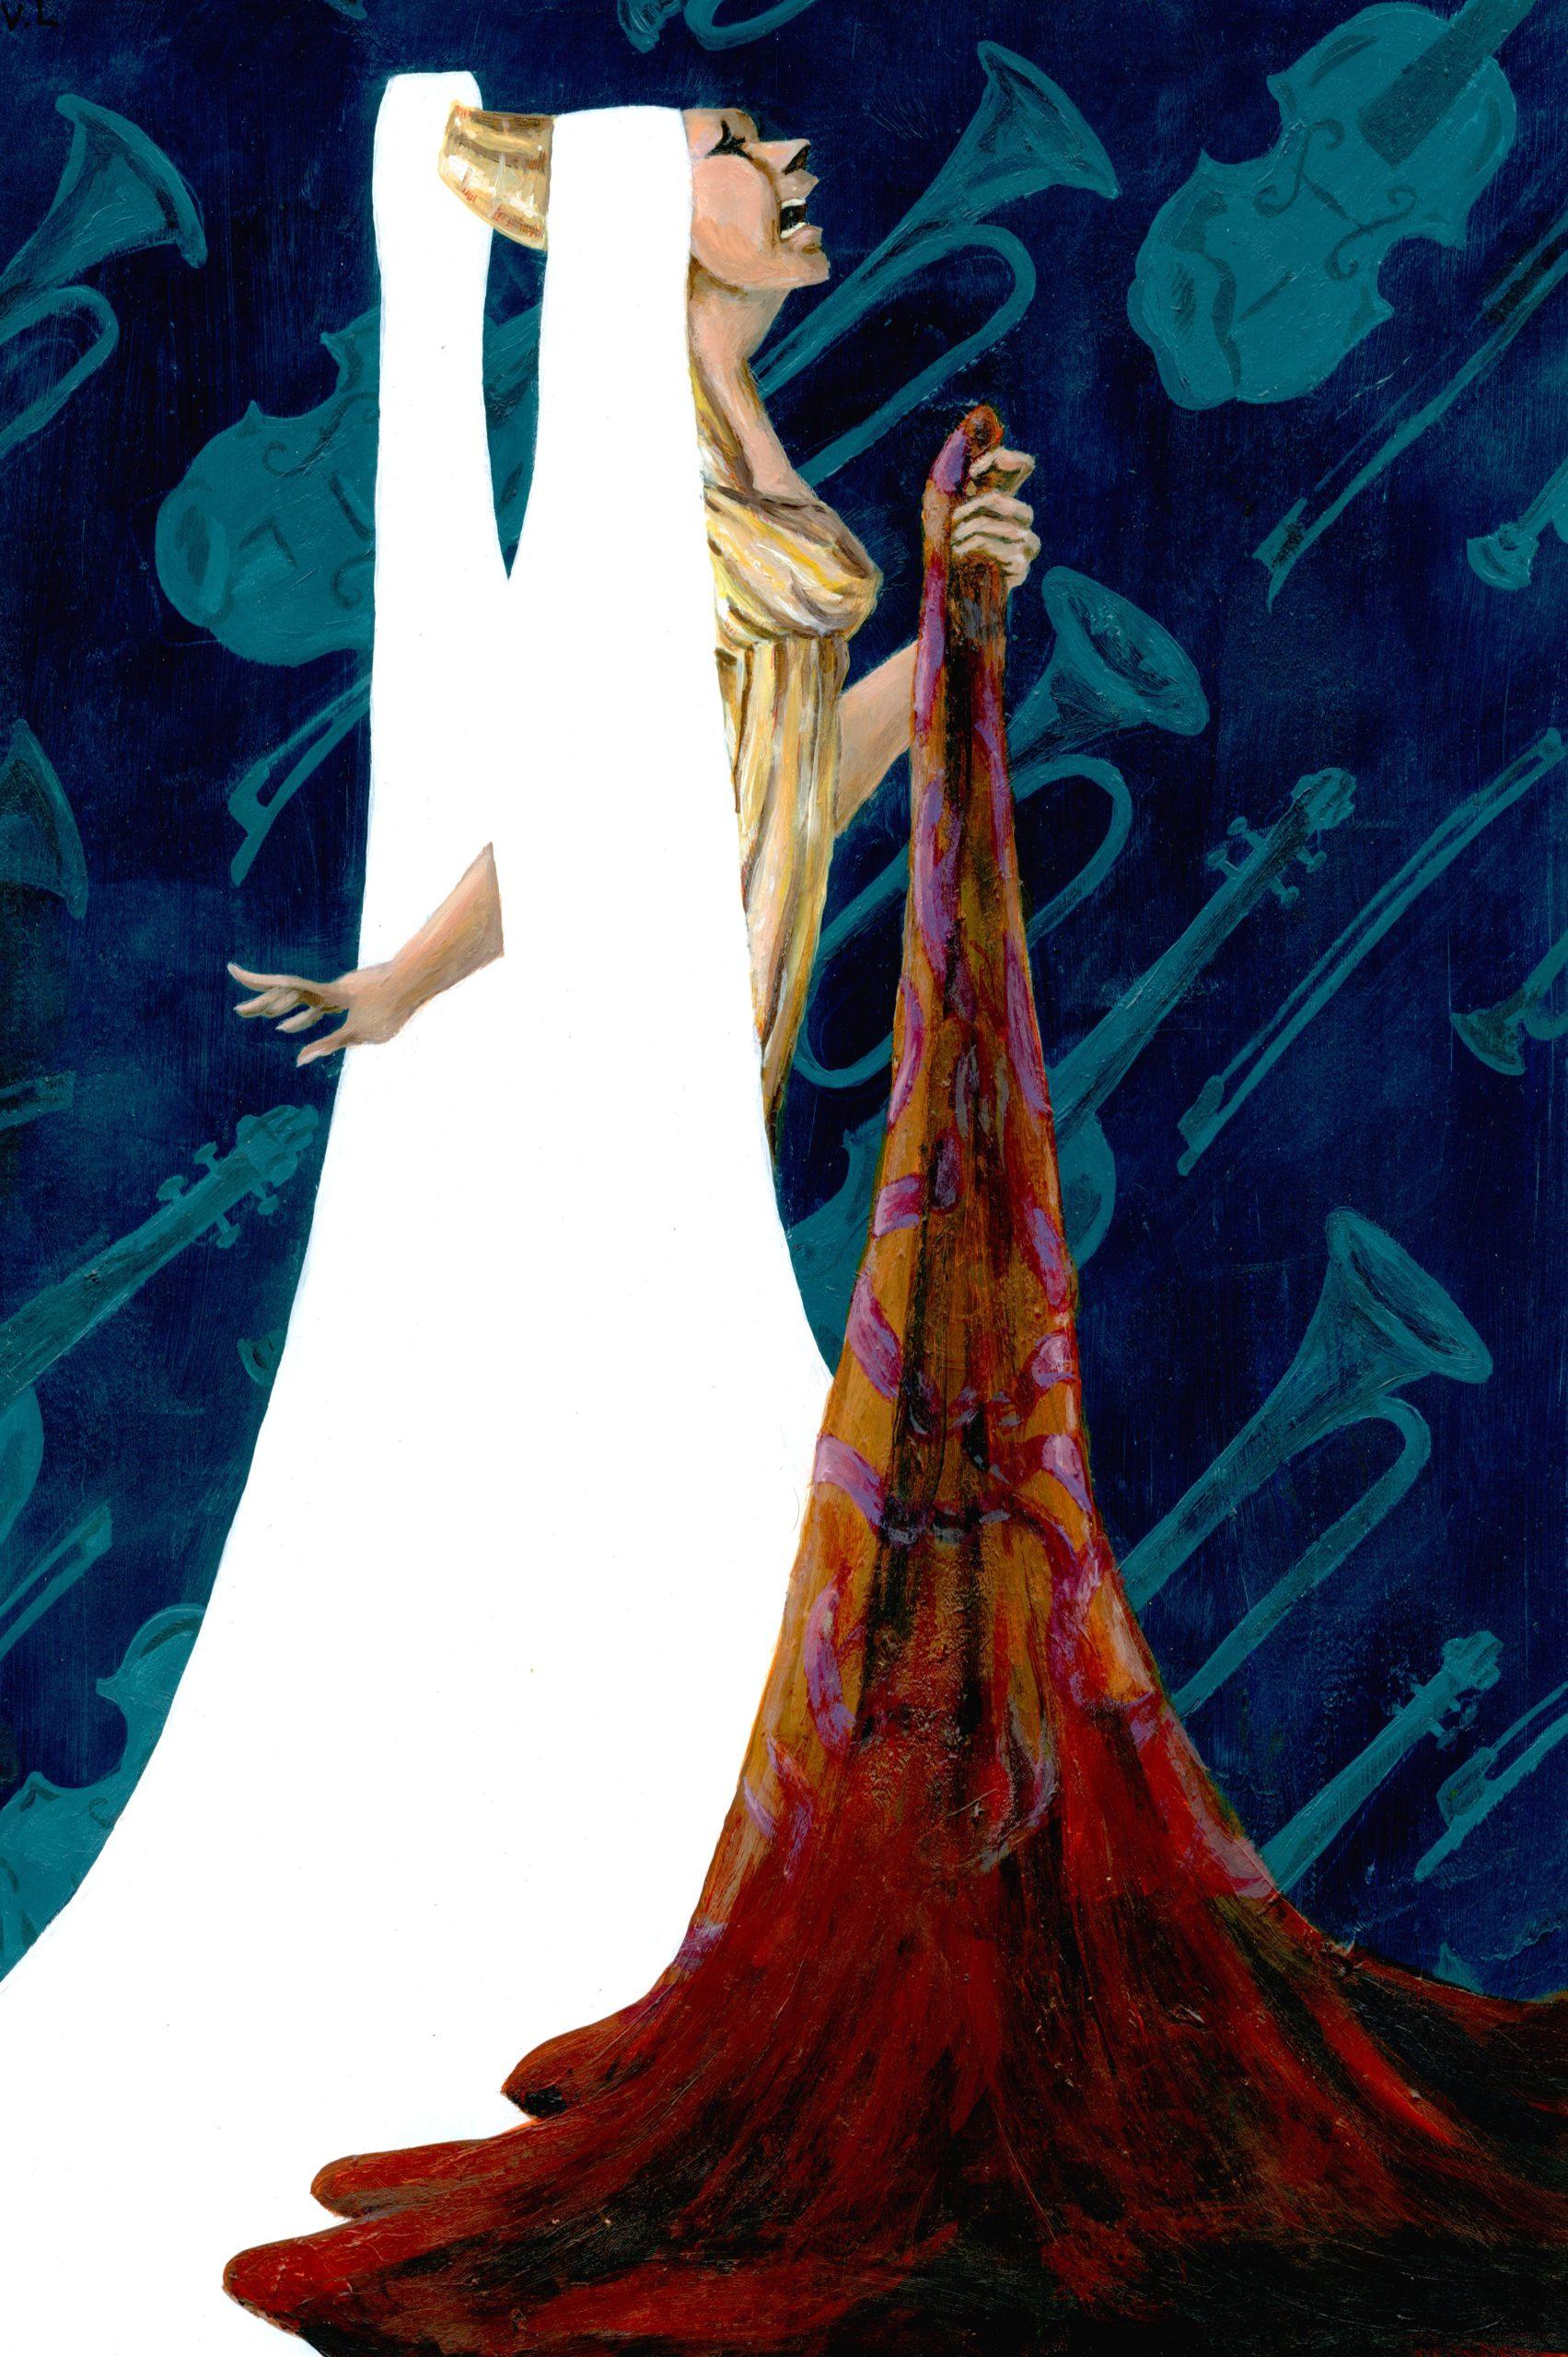 Hercules student artwork from MassArt, LaChapelle